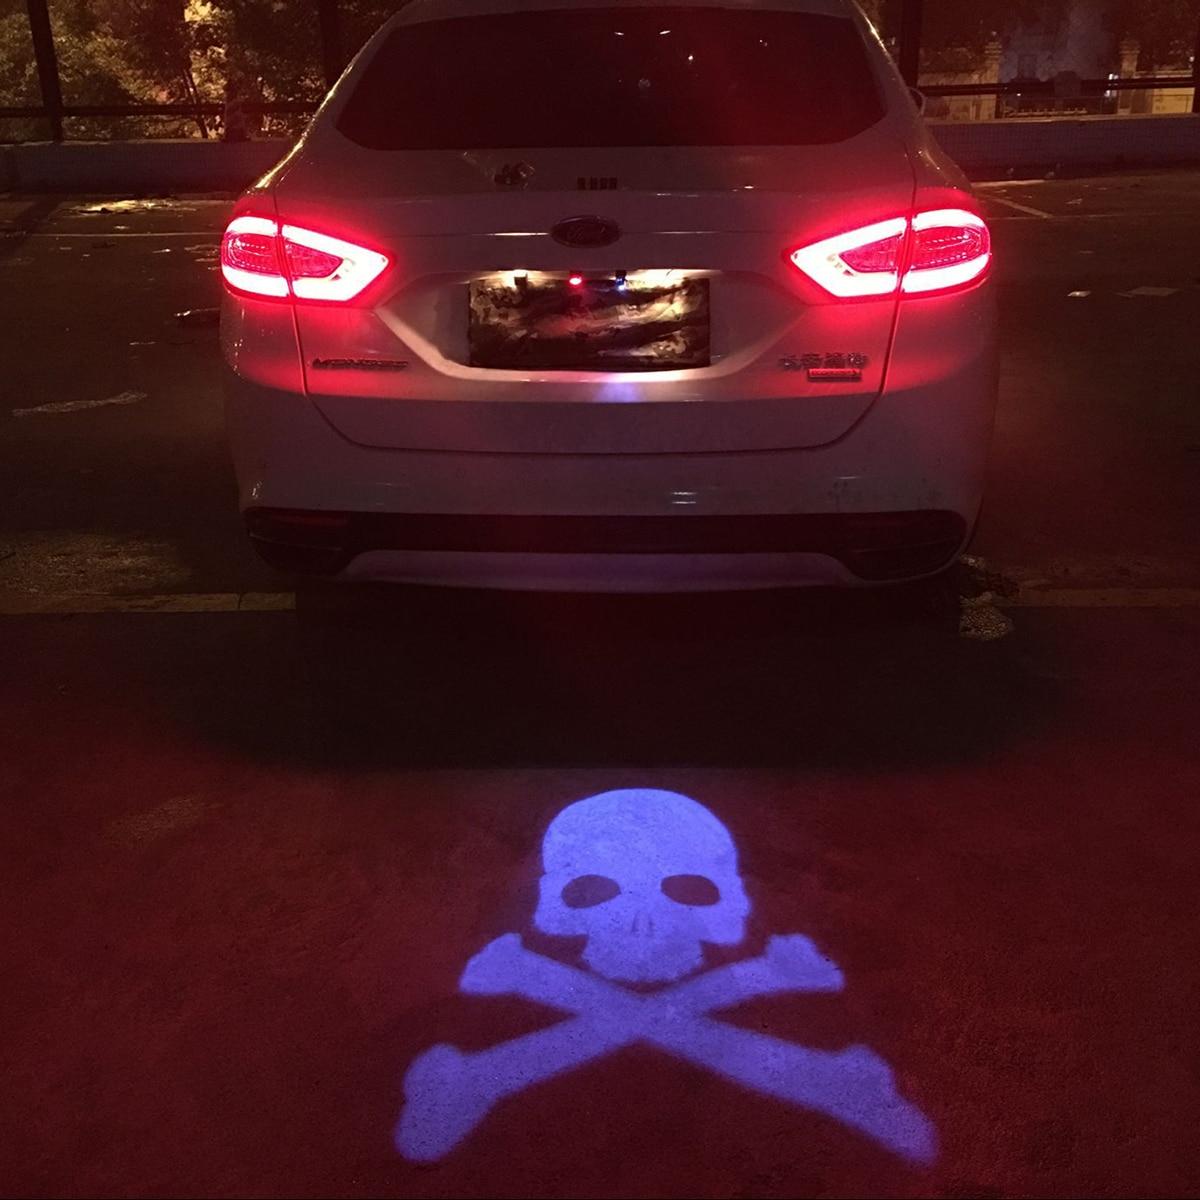 Car Laser Tail Led Light Anti Collision Rear-end Fog Lamp Rearing Warning for Nissan Tiida NV200 Pathfinder Qashqai Logo